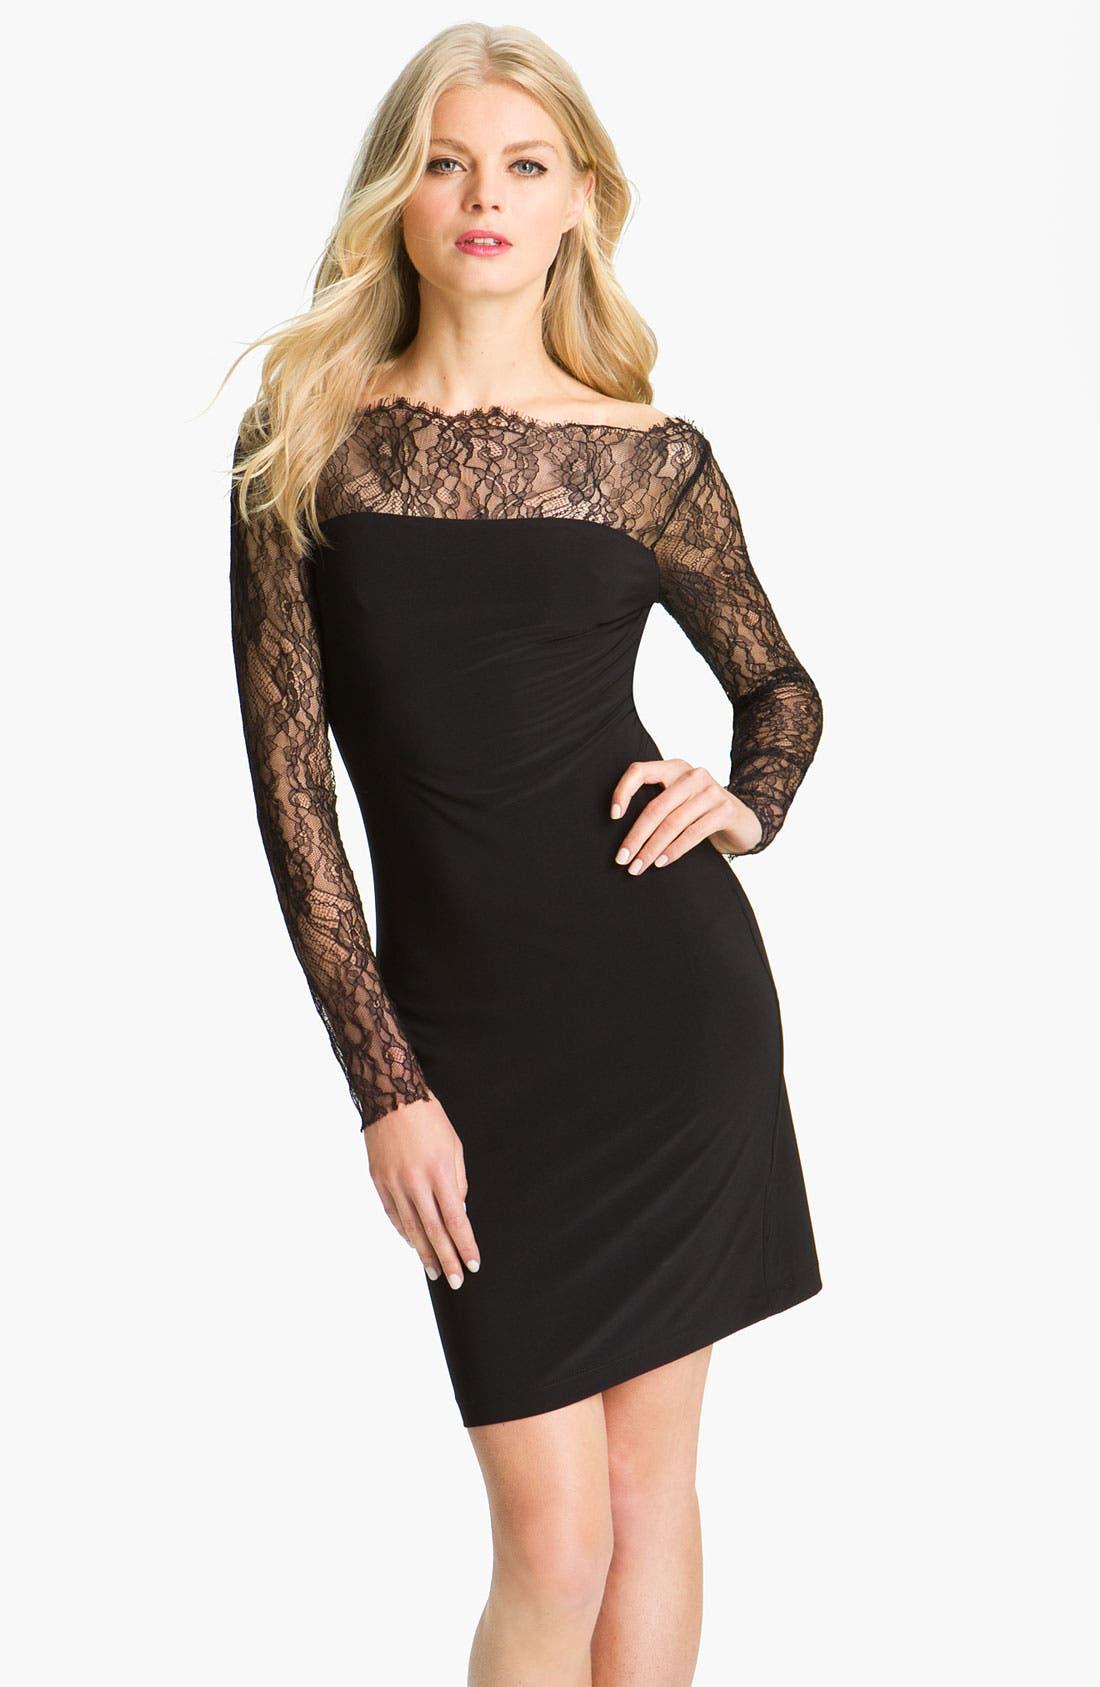 Alternate Image 1 Selected - ABS by Allen Schwartz Lace Sleeve Jersey Sheath Dress